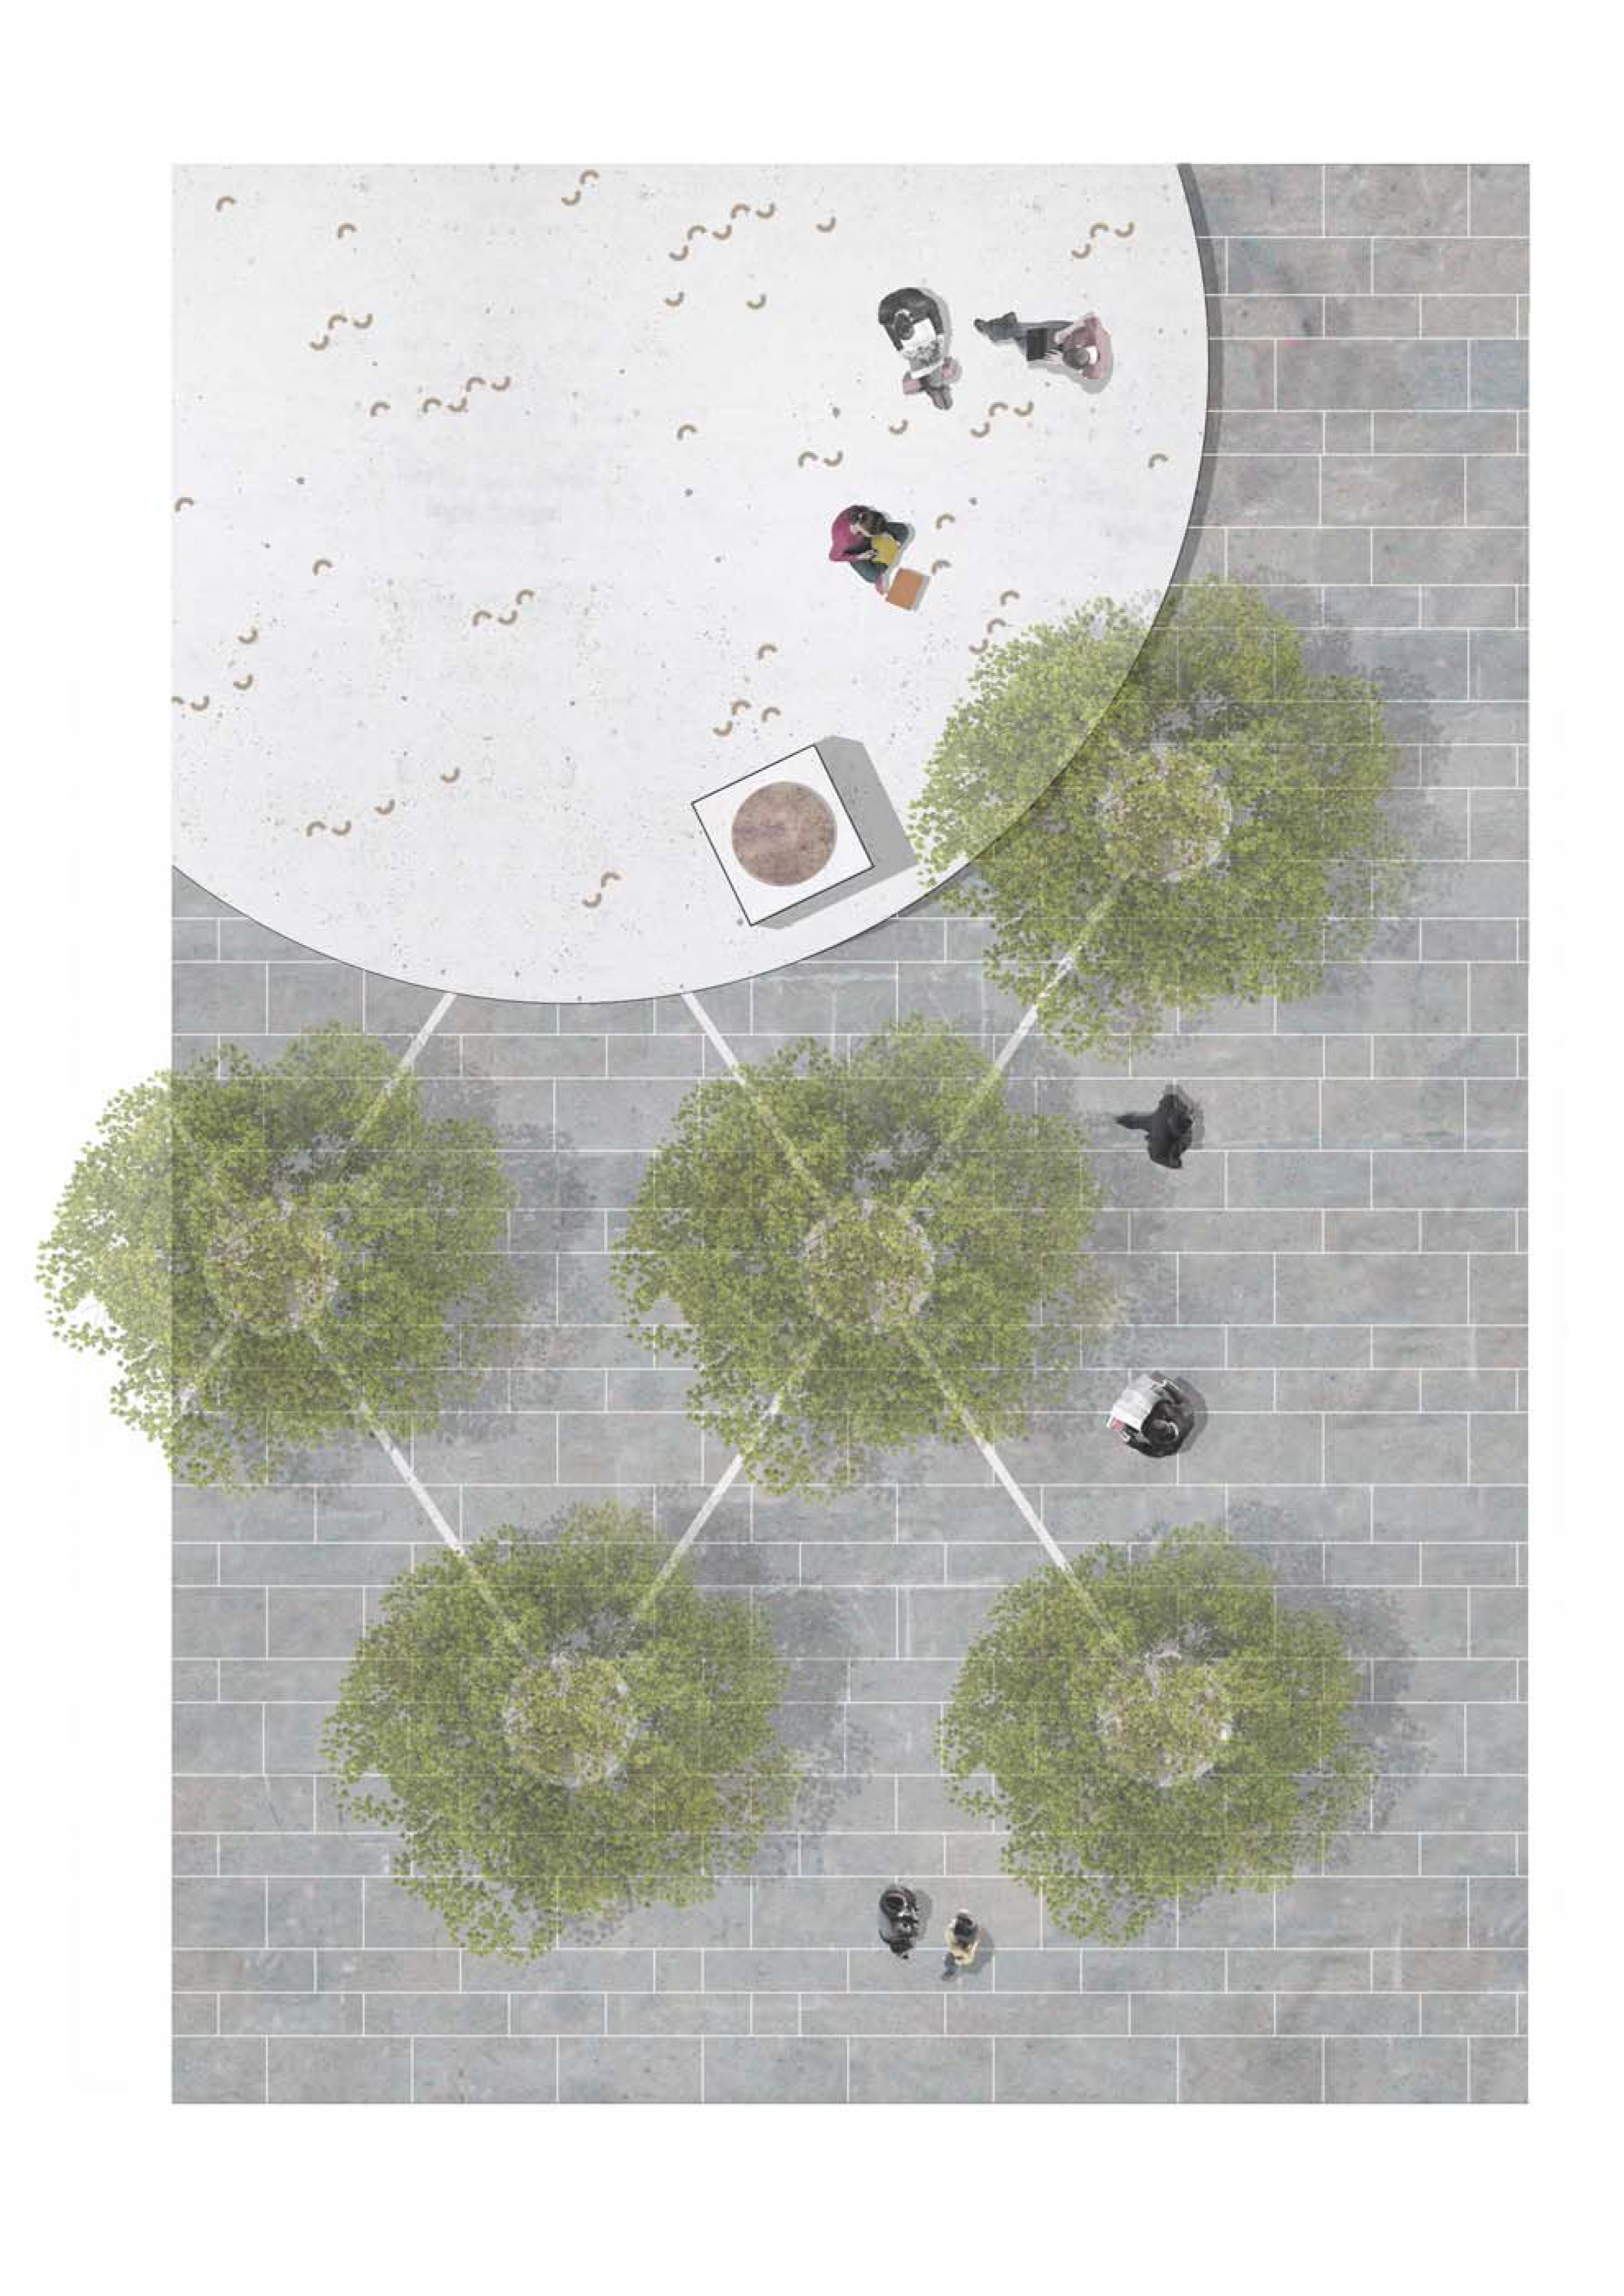 Architecture_Kombinat-Tina Rugelj_part of the plan_2.jpg